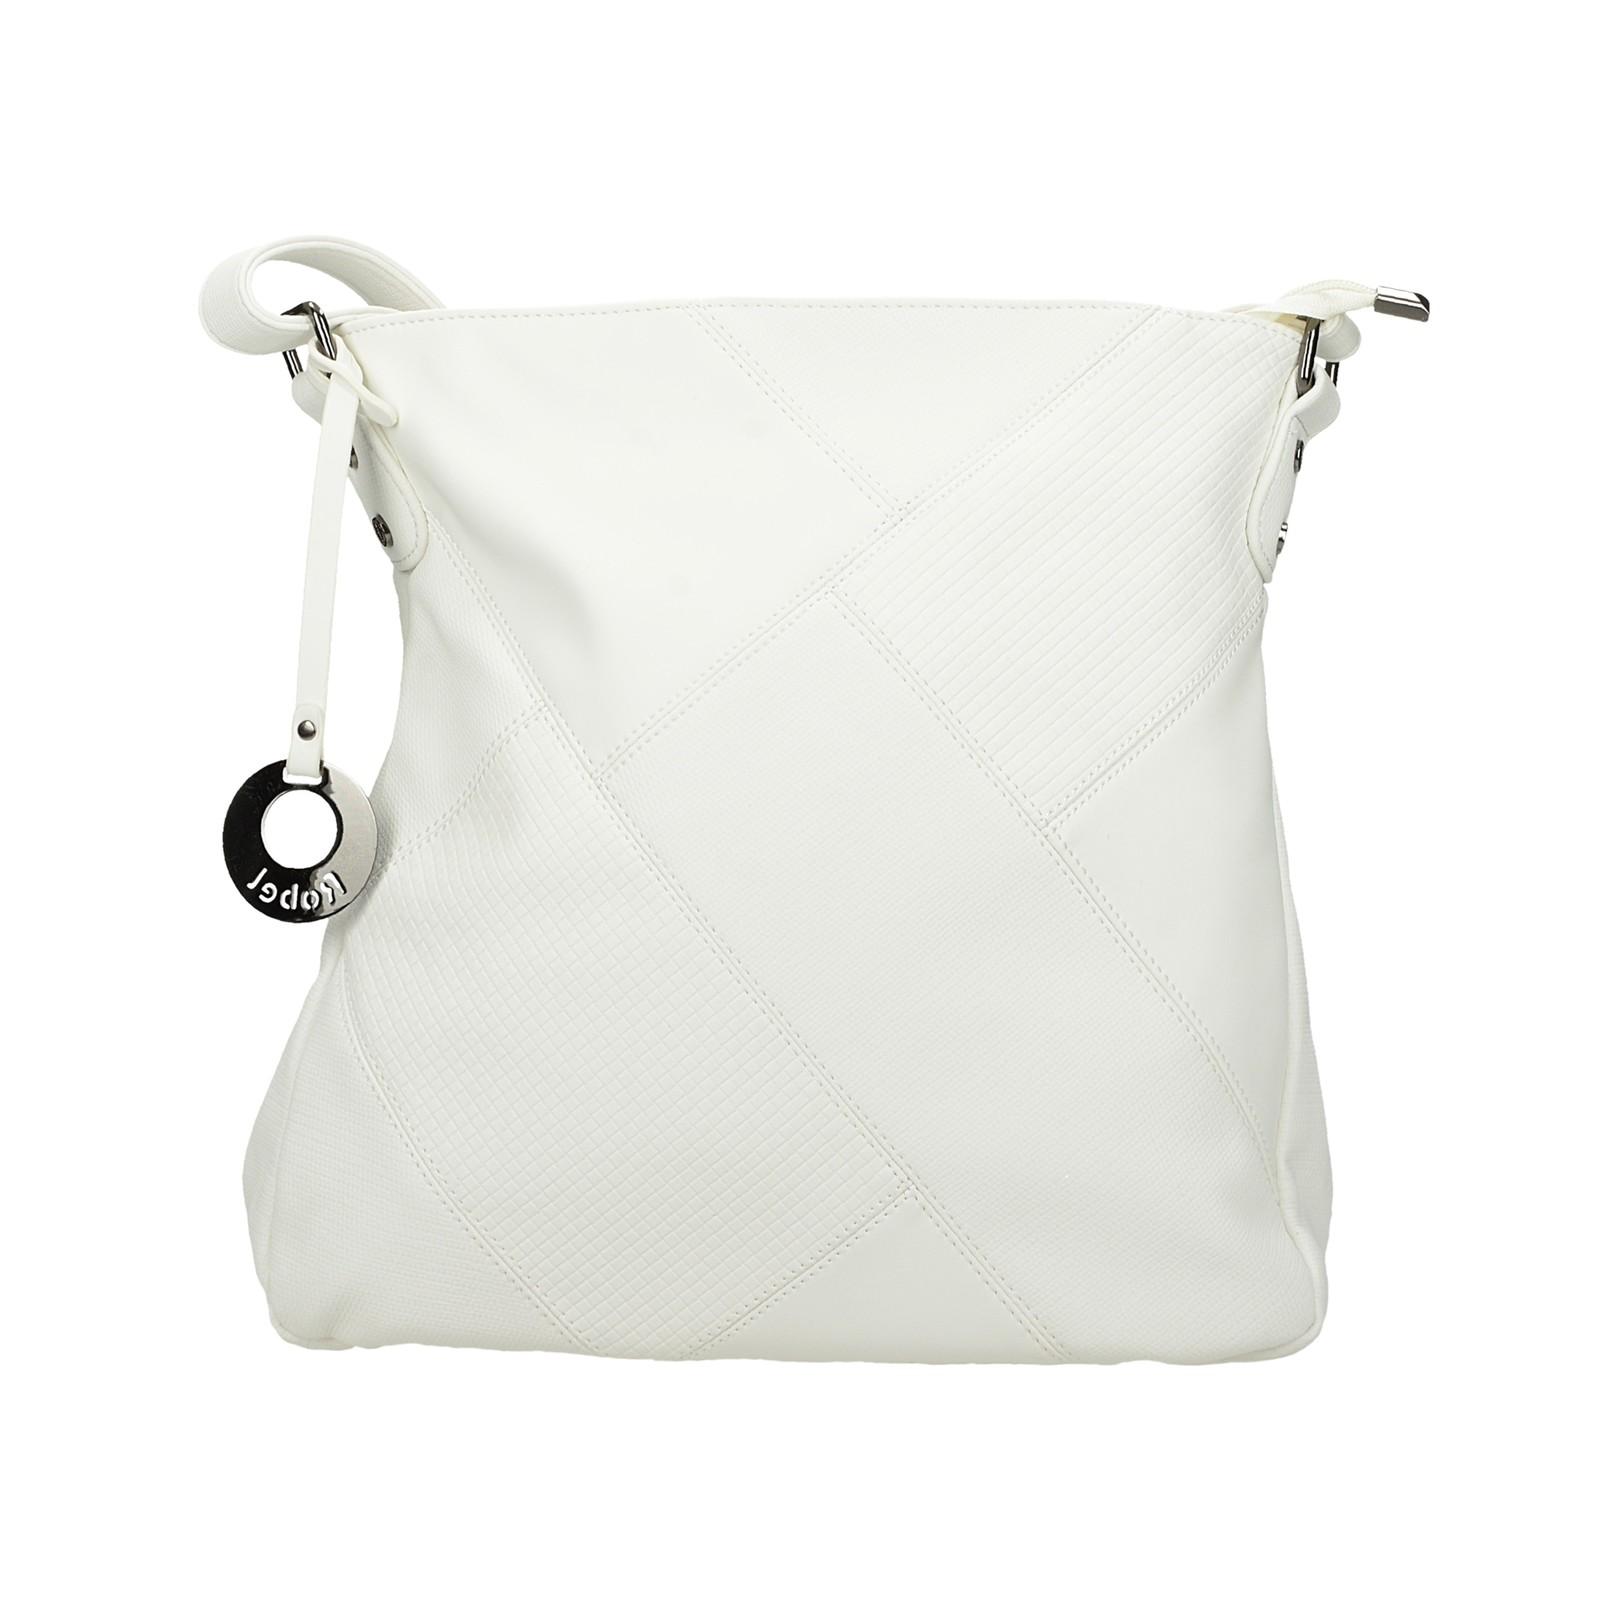 Robel dámská crossbody kabelka - bílá